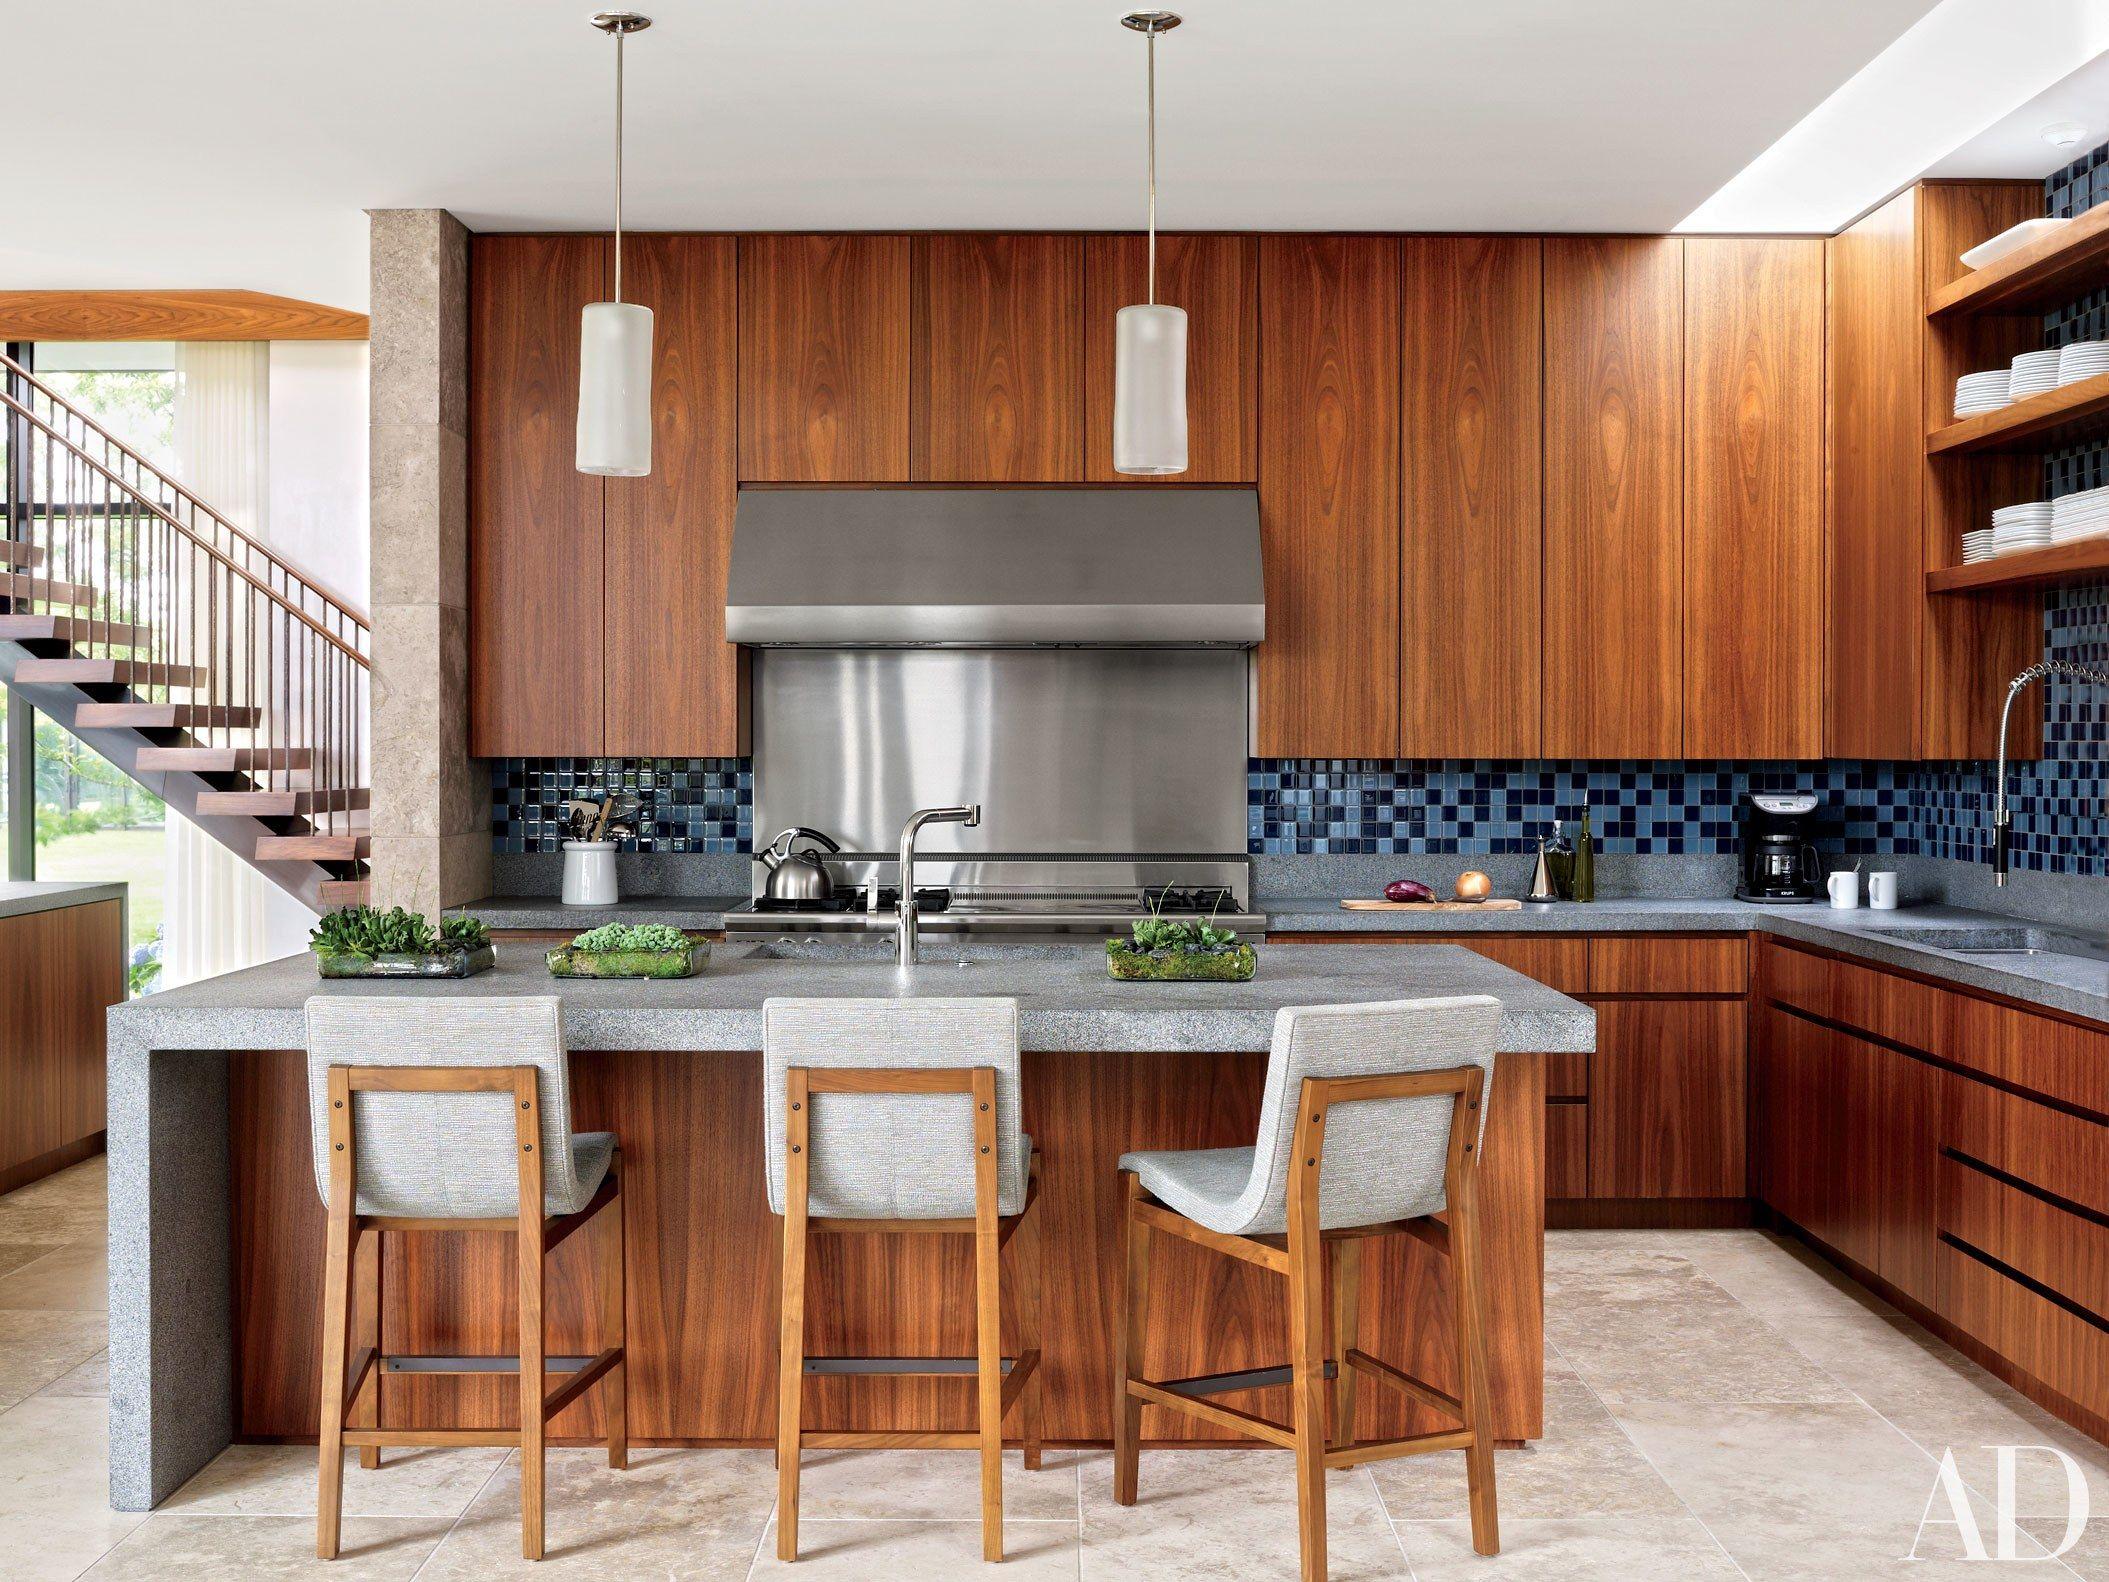 How to Create a Sleek Contemporary Kitchen | Diseño cocinas, Baño y ...